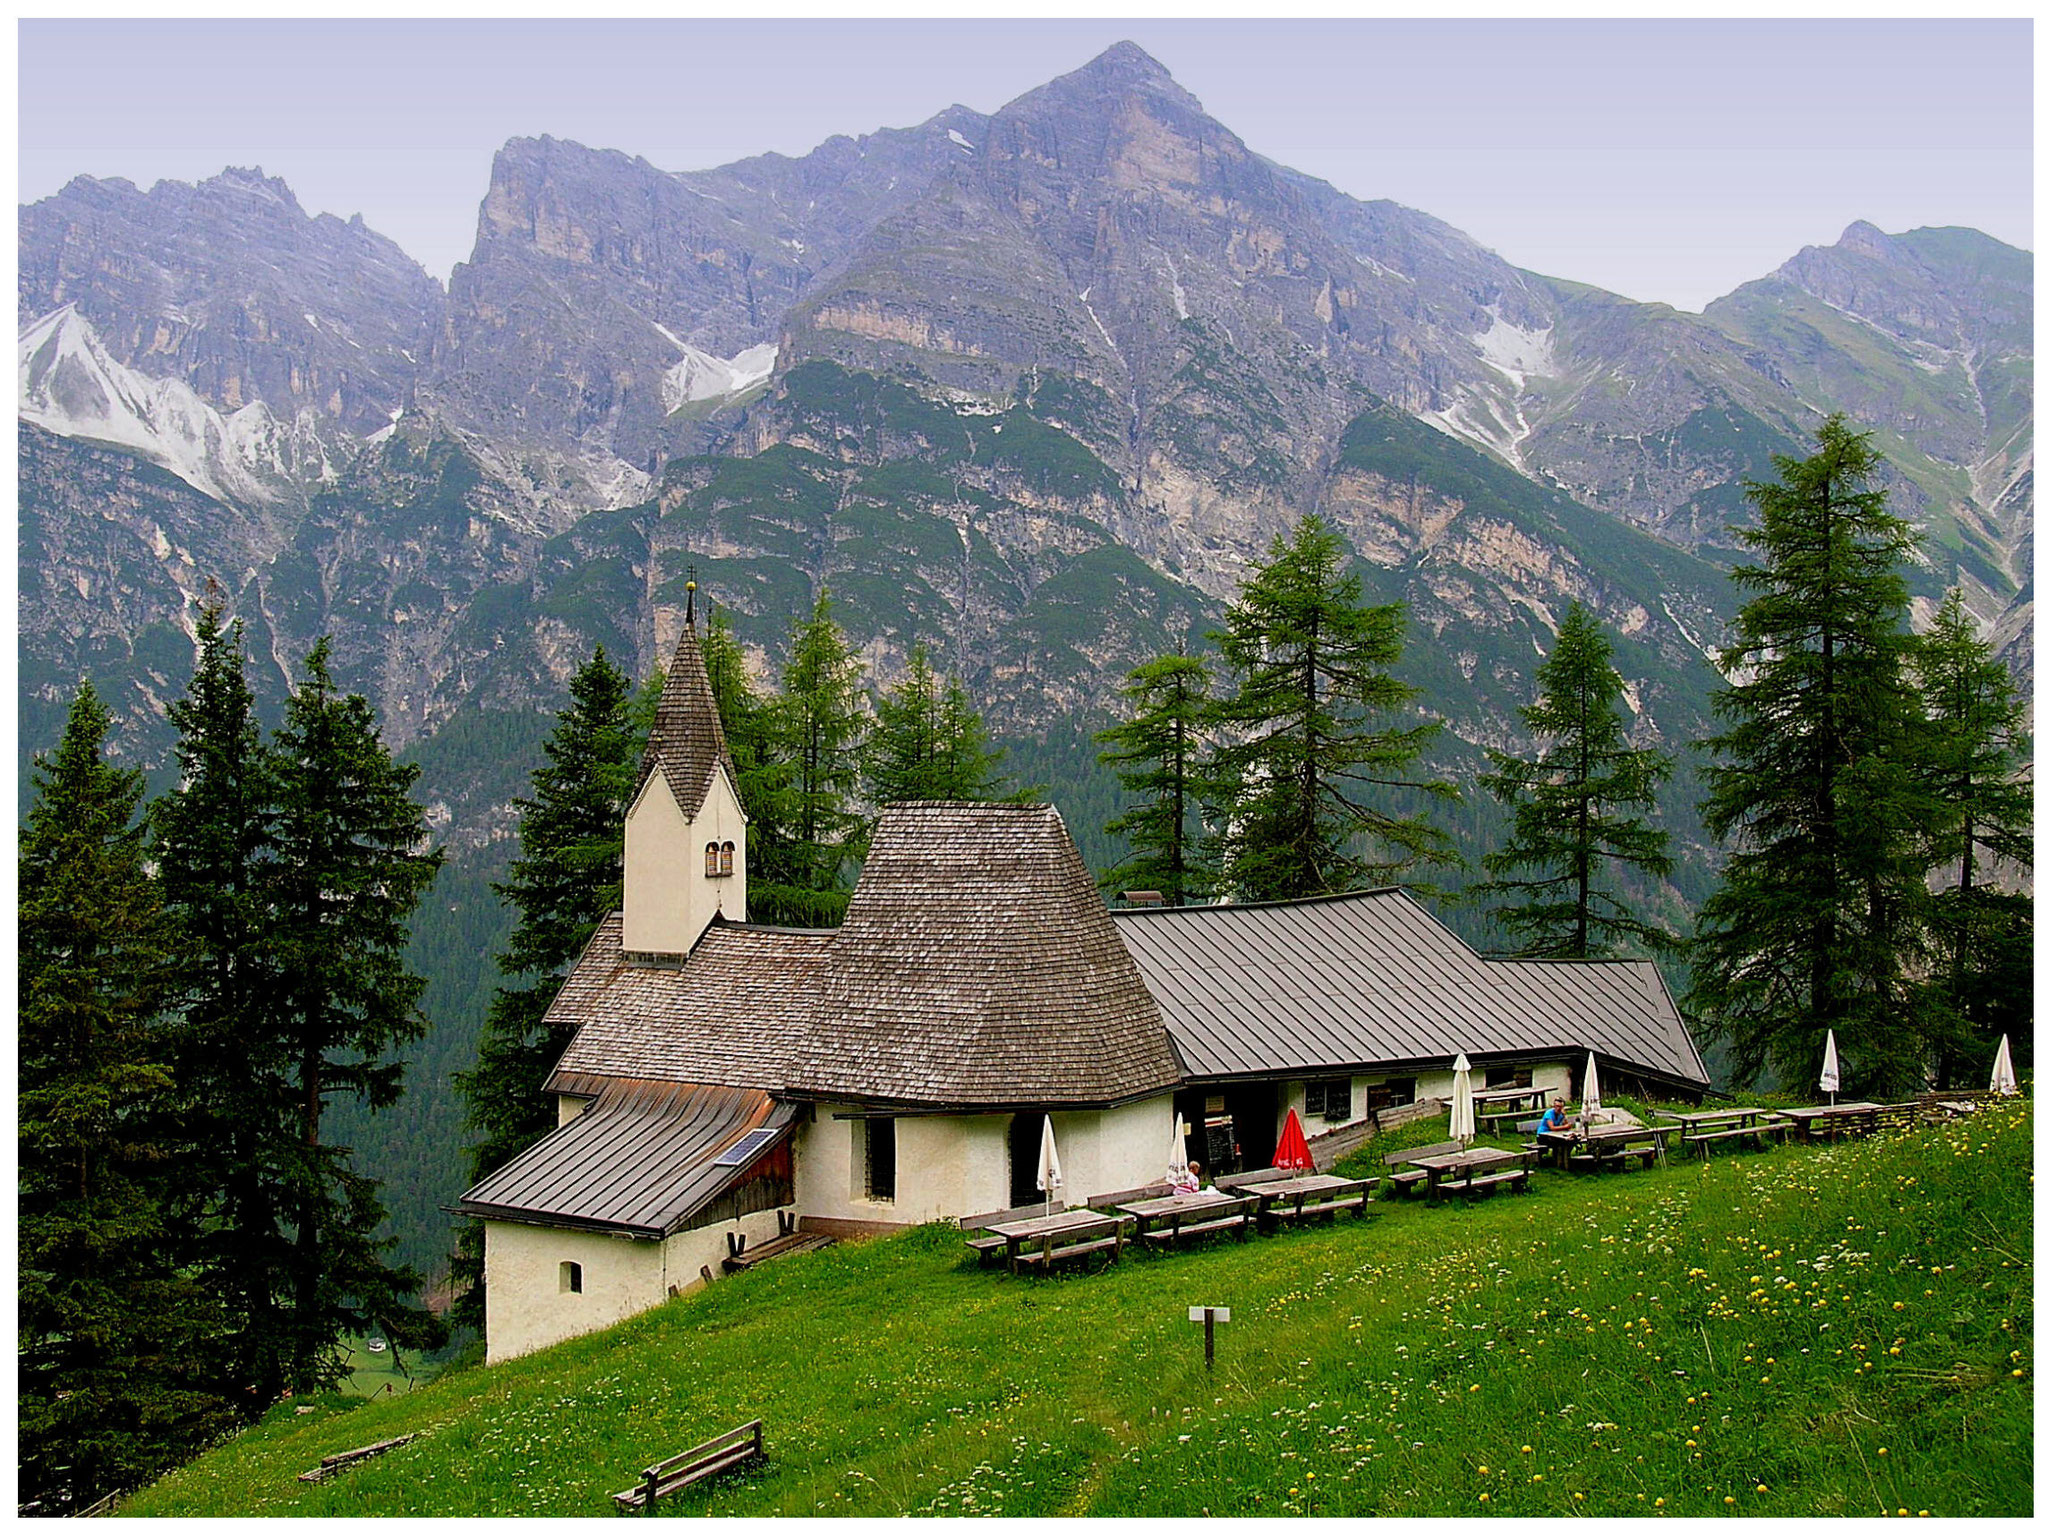 St. Magdalena, Gschnitz (Tirol)